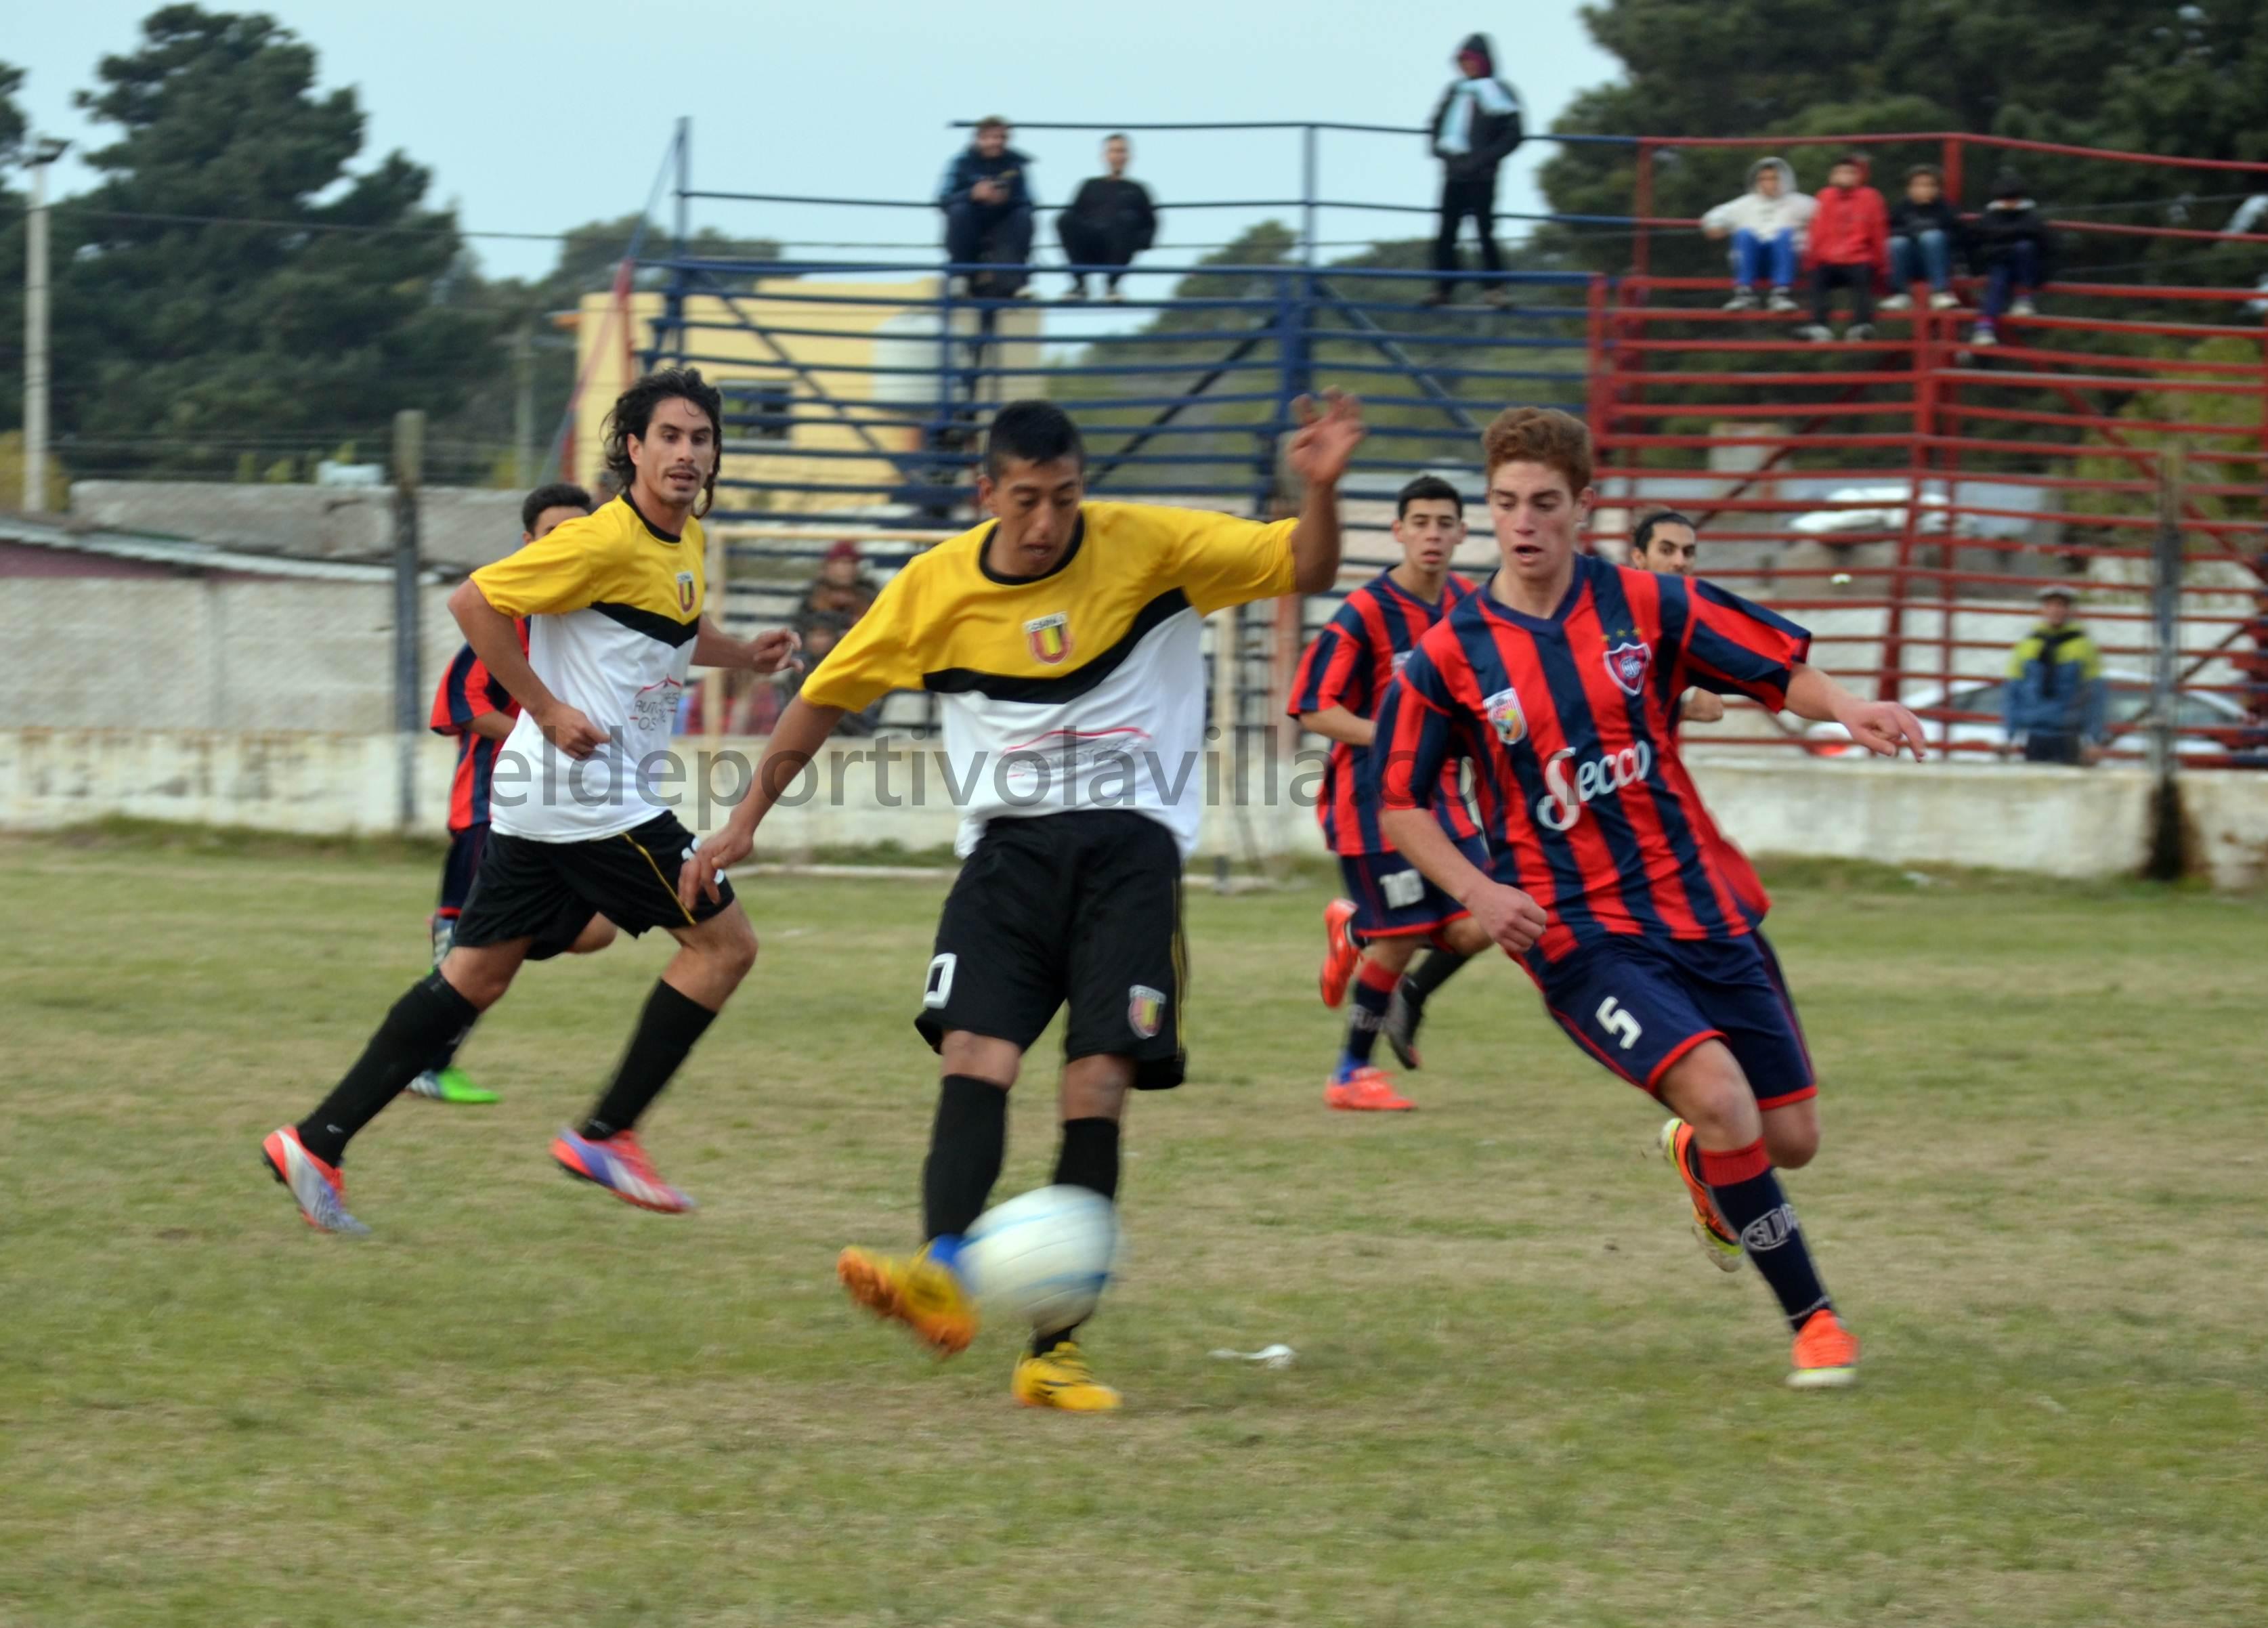 San Lorenzo Villa Gesell  76caac33c2e0f